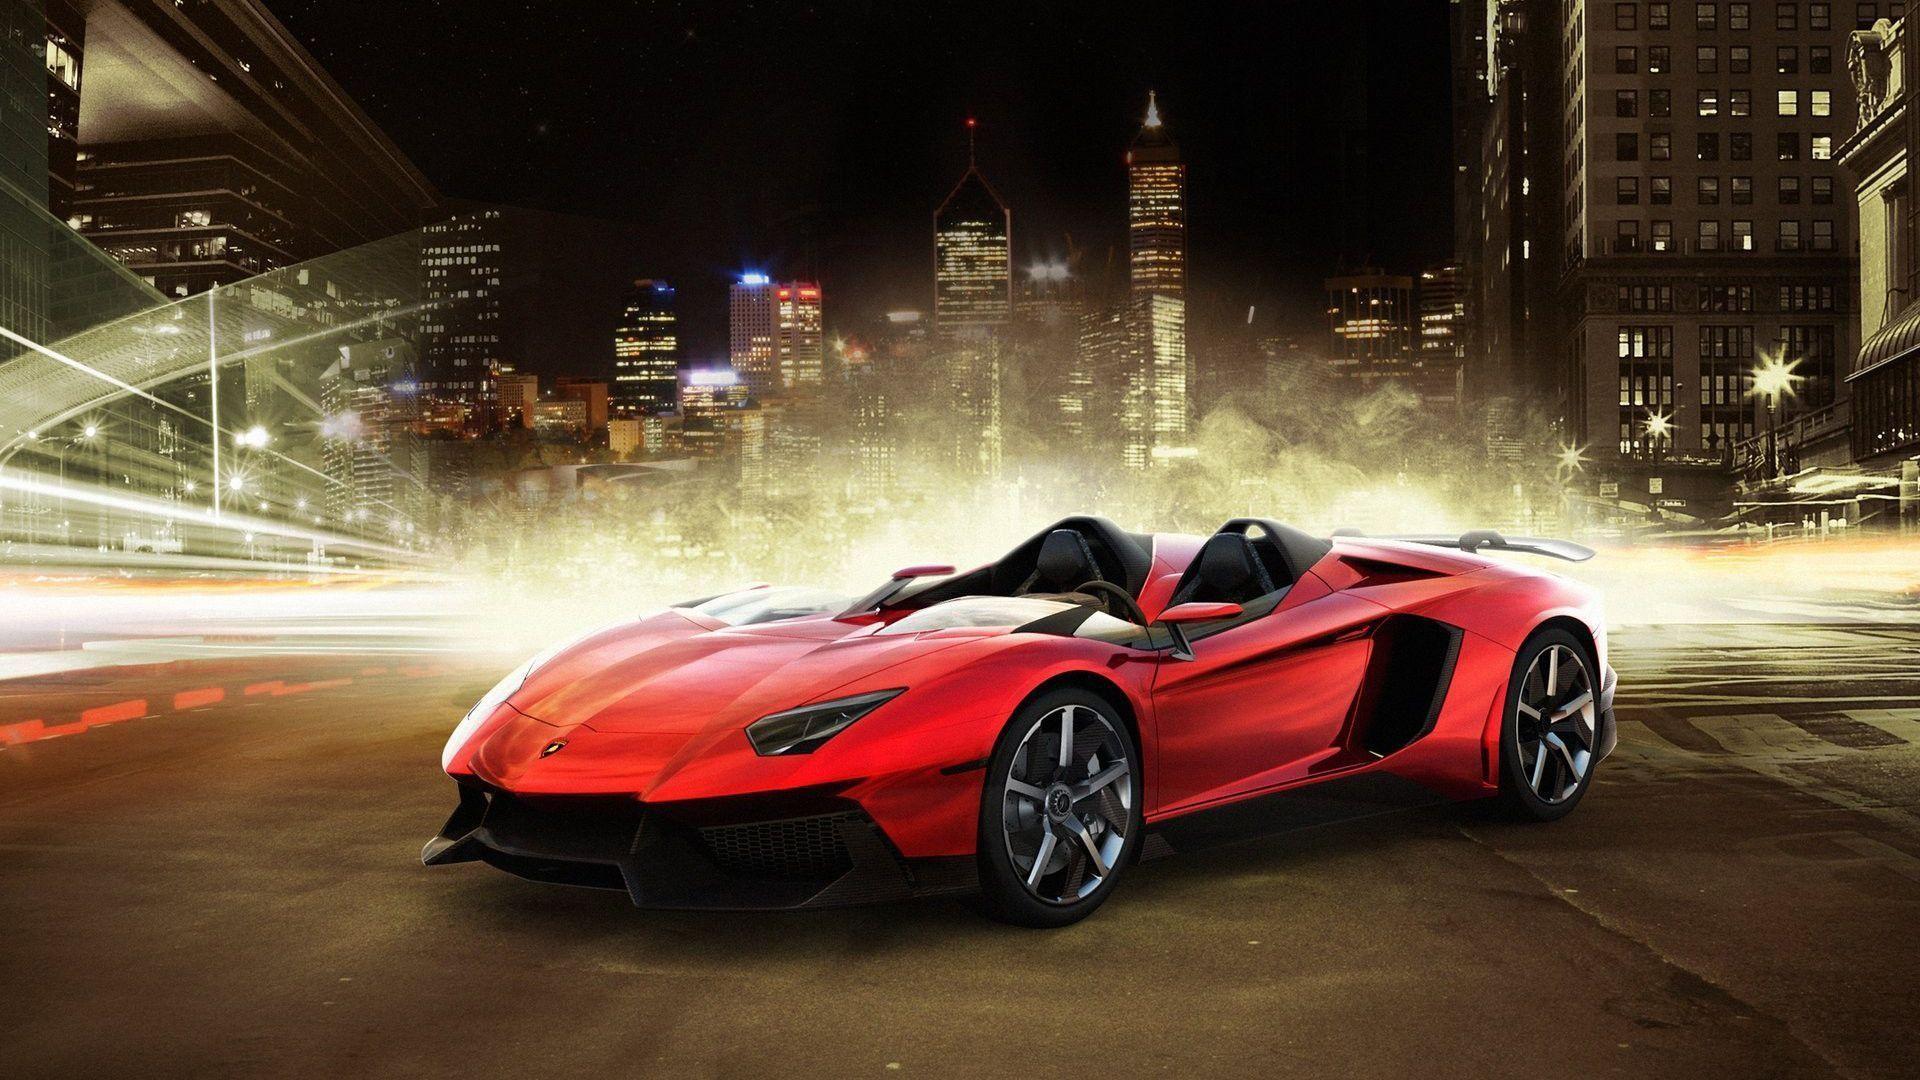 Hd Cars Wallpapers-1080p Red In Color | HD Wallpapers | Desktop .